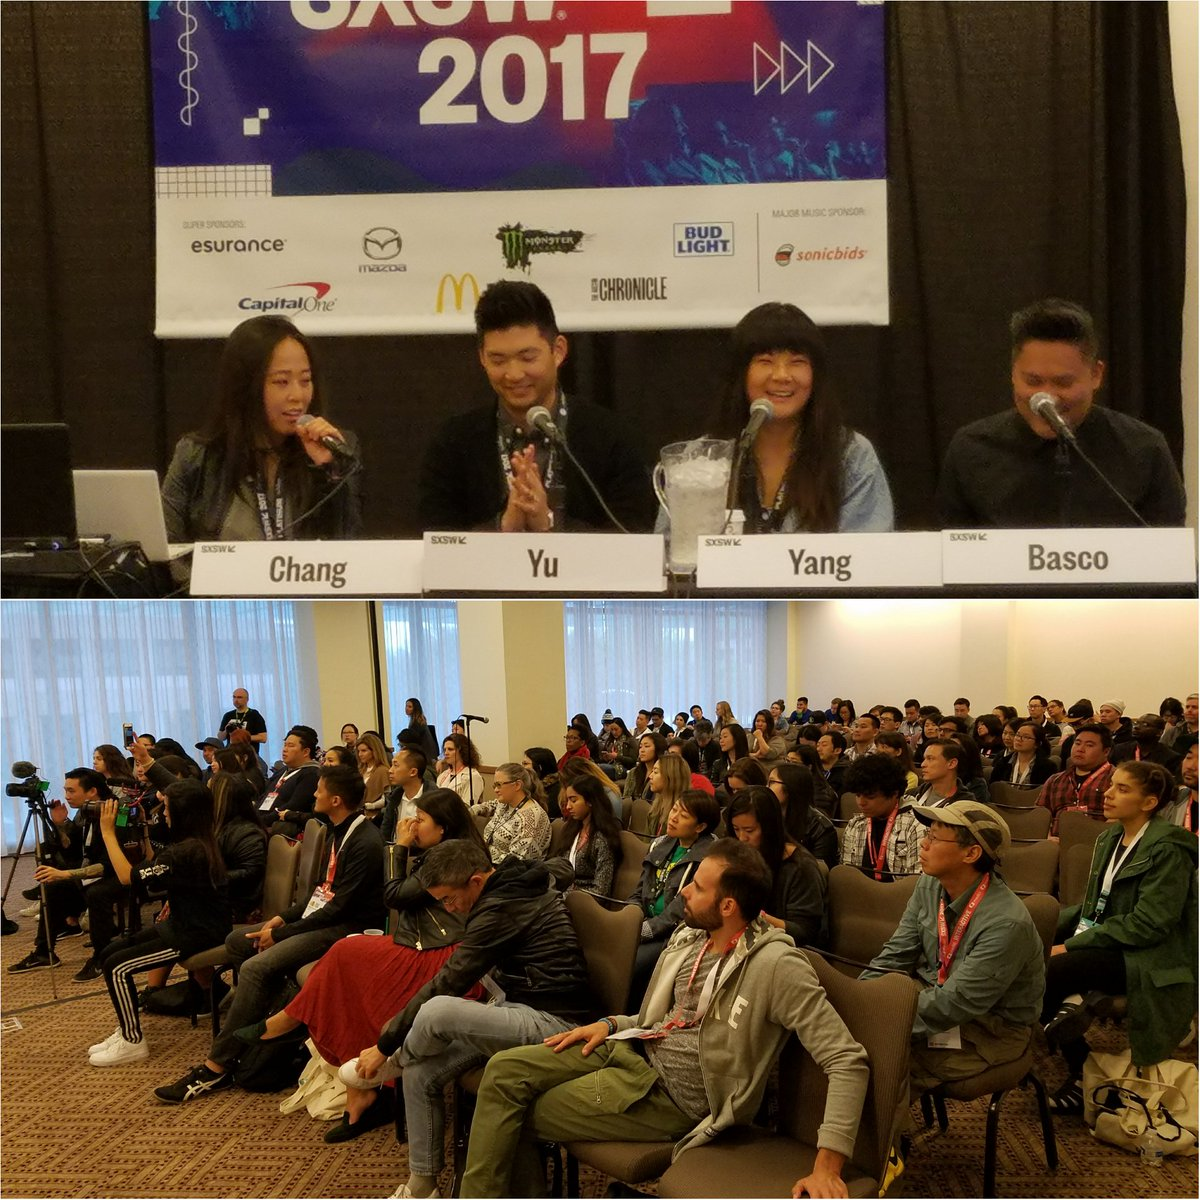 SXSW-kollab-AsianAmerican-media-representation.jpg